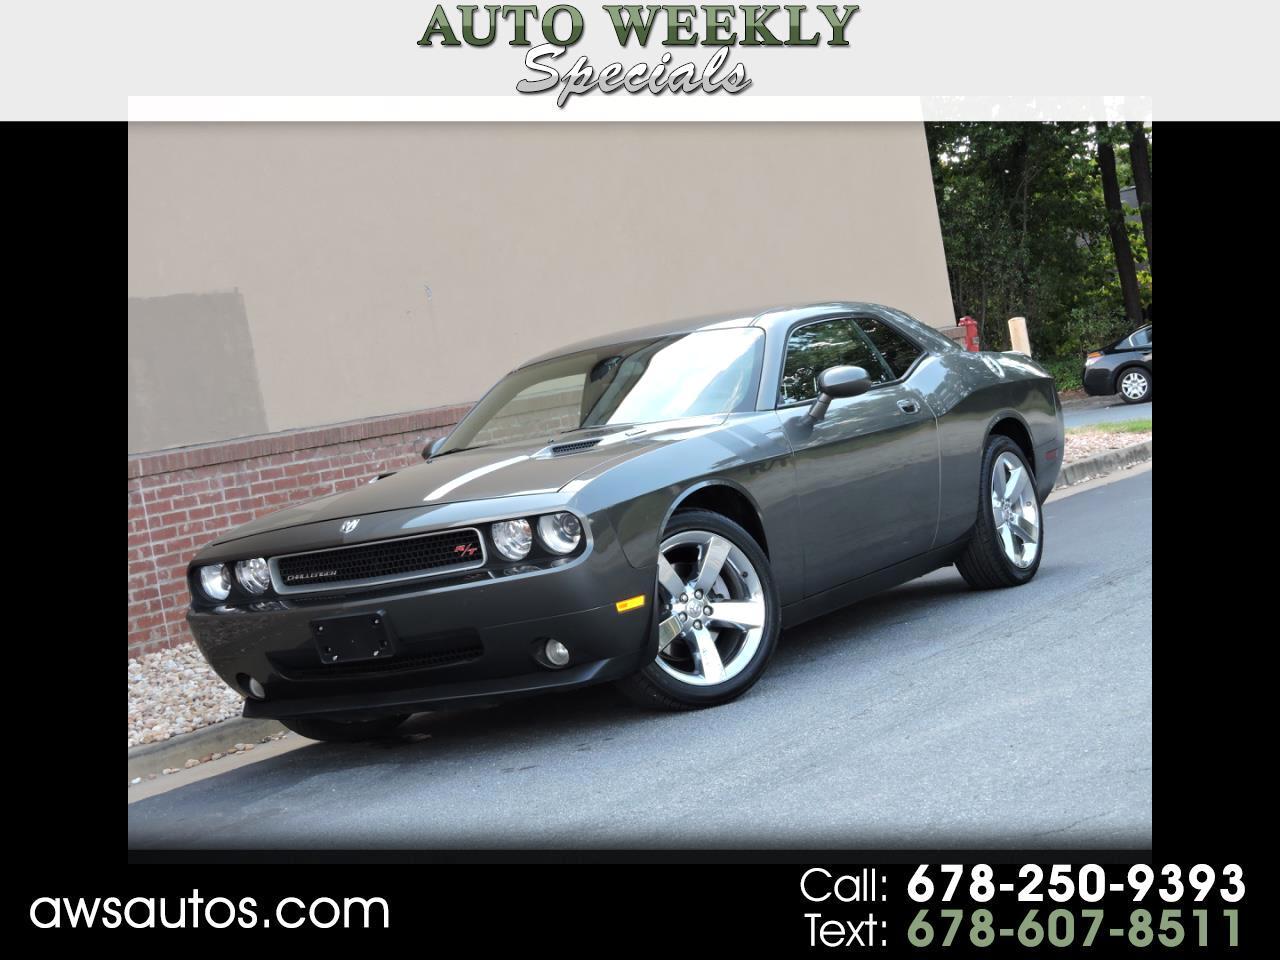 2009 Dodge Challenger 2dr Cpe R/T